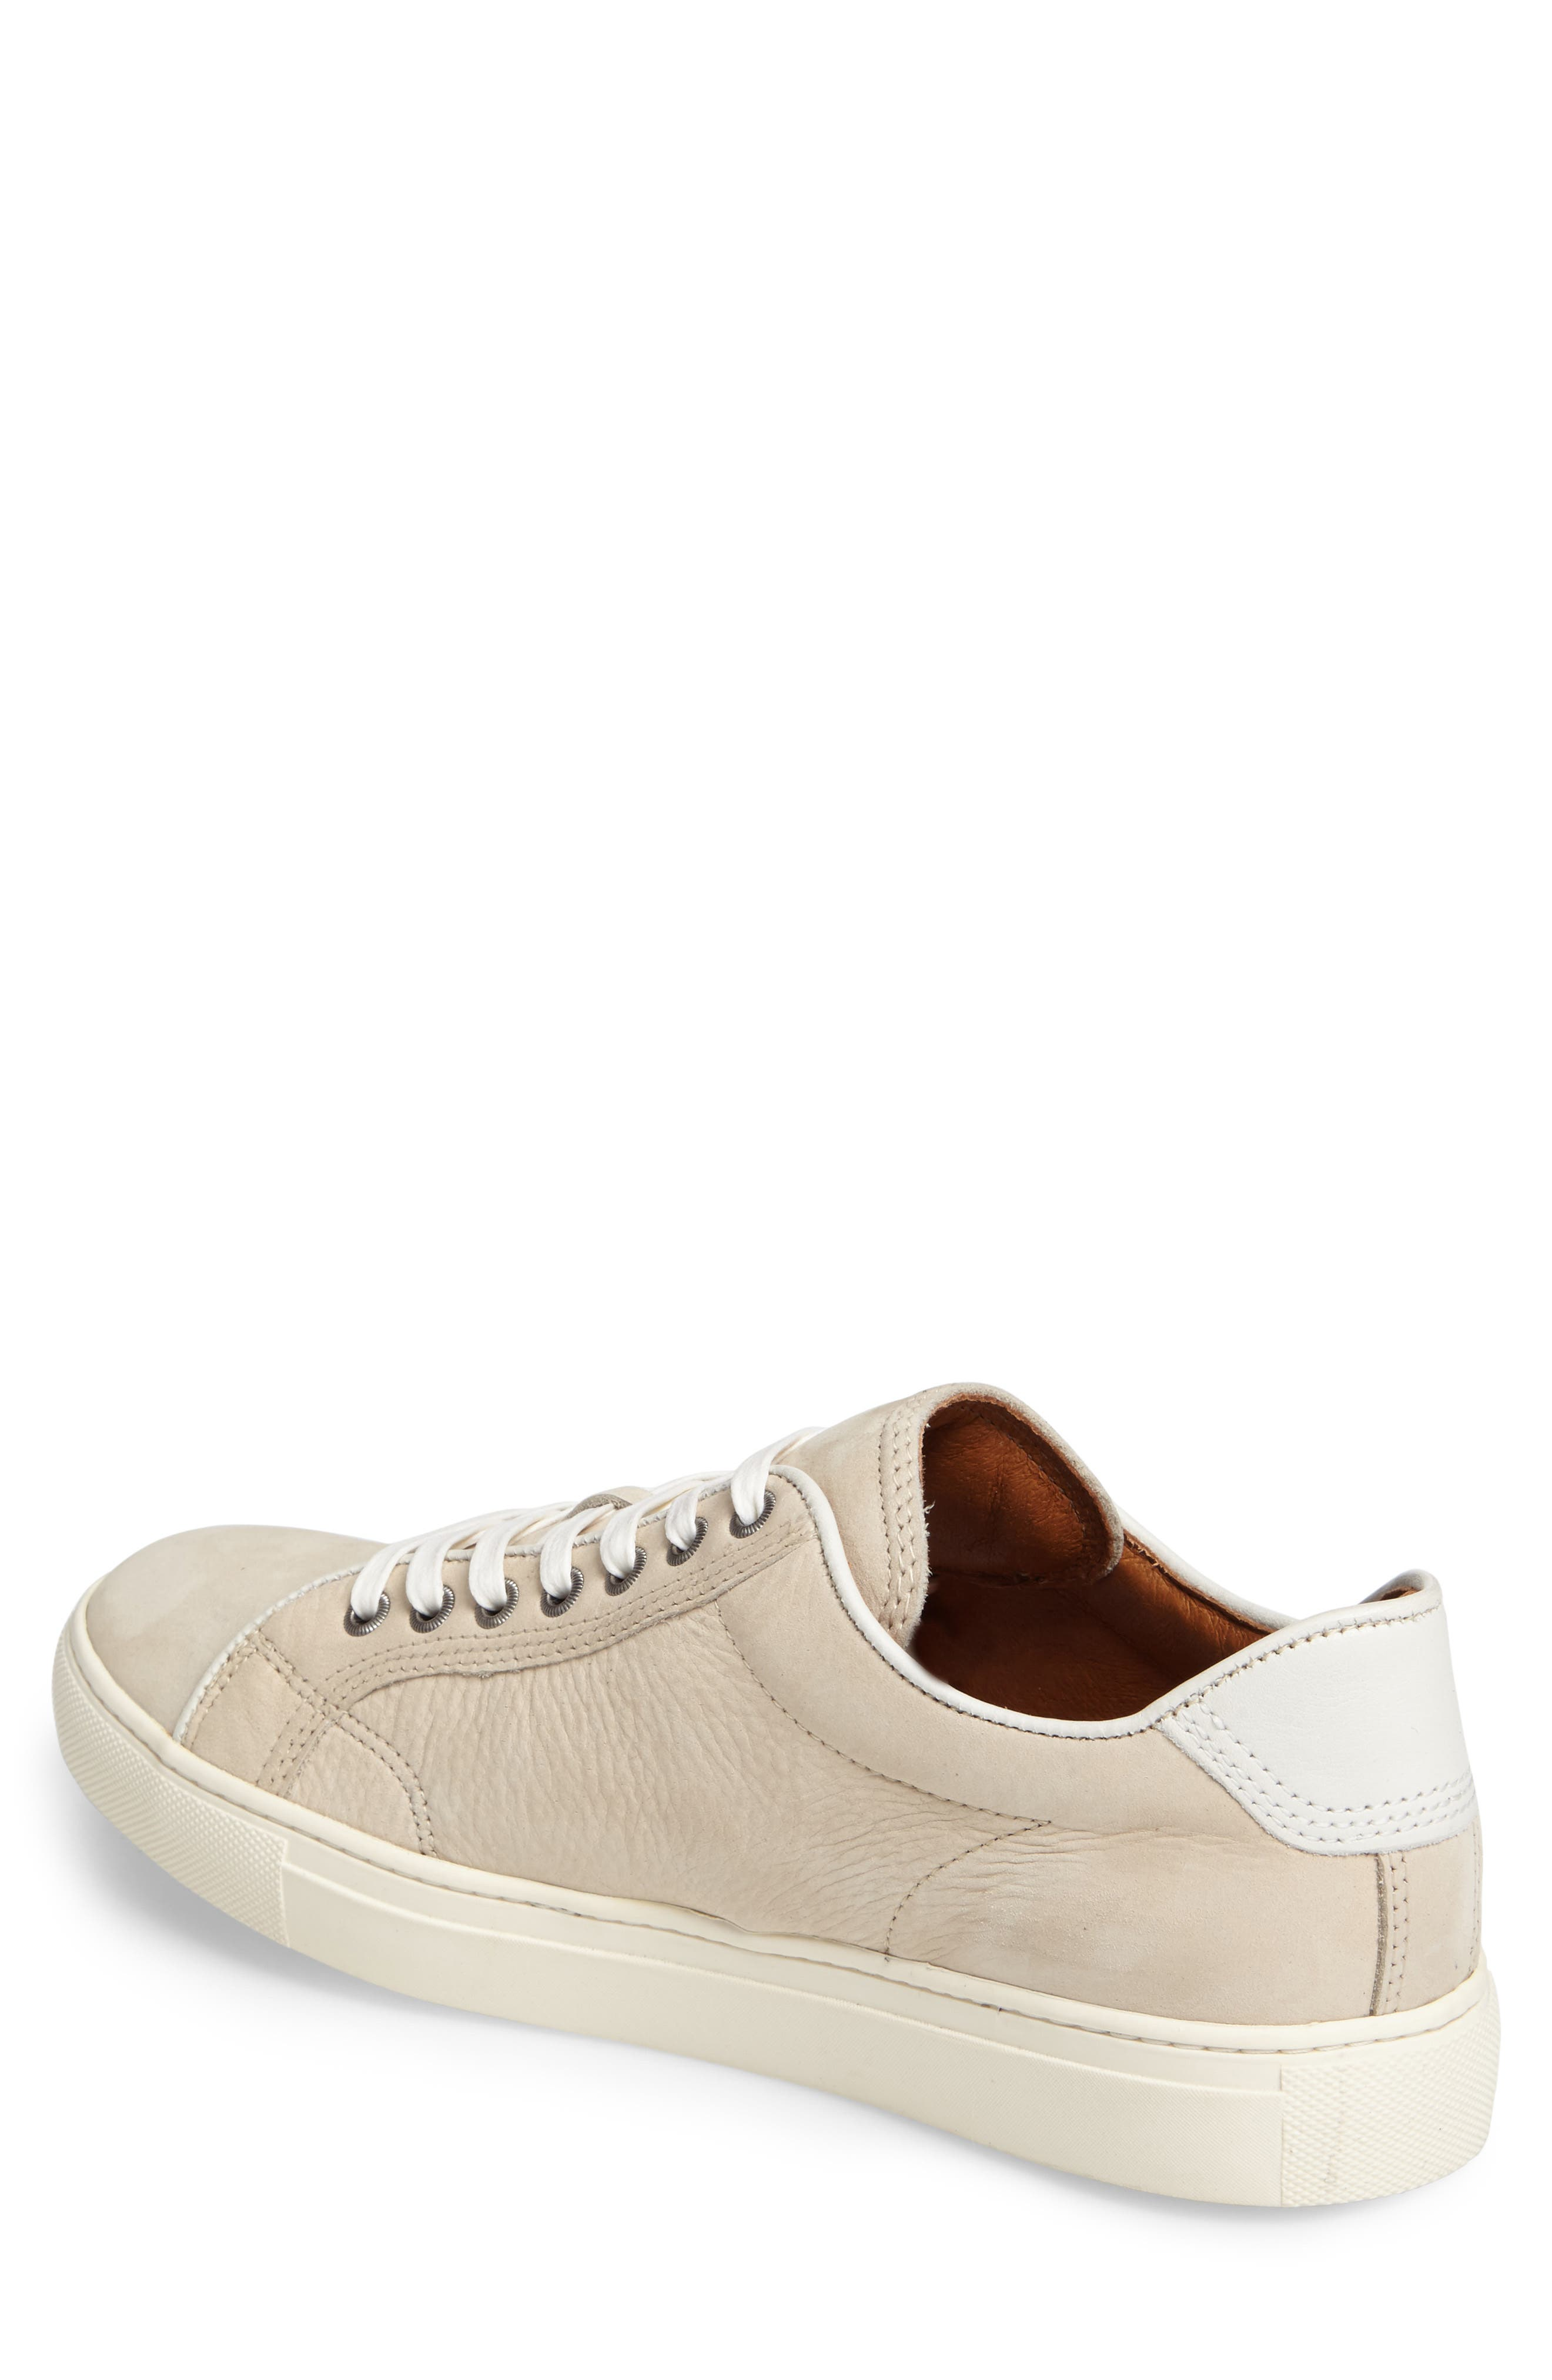 Walker Low Top Sneaker,                             Alternate thumbnail 2, color,                             Ivory